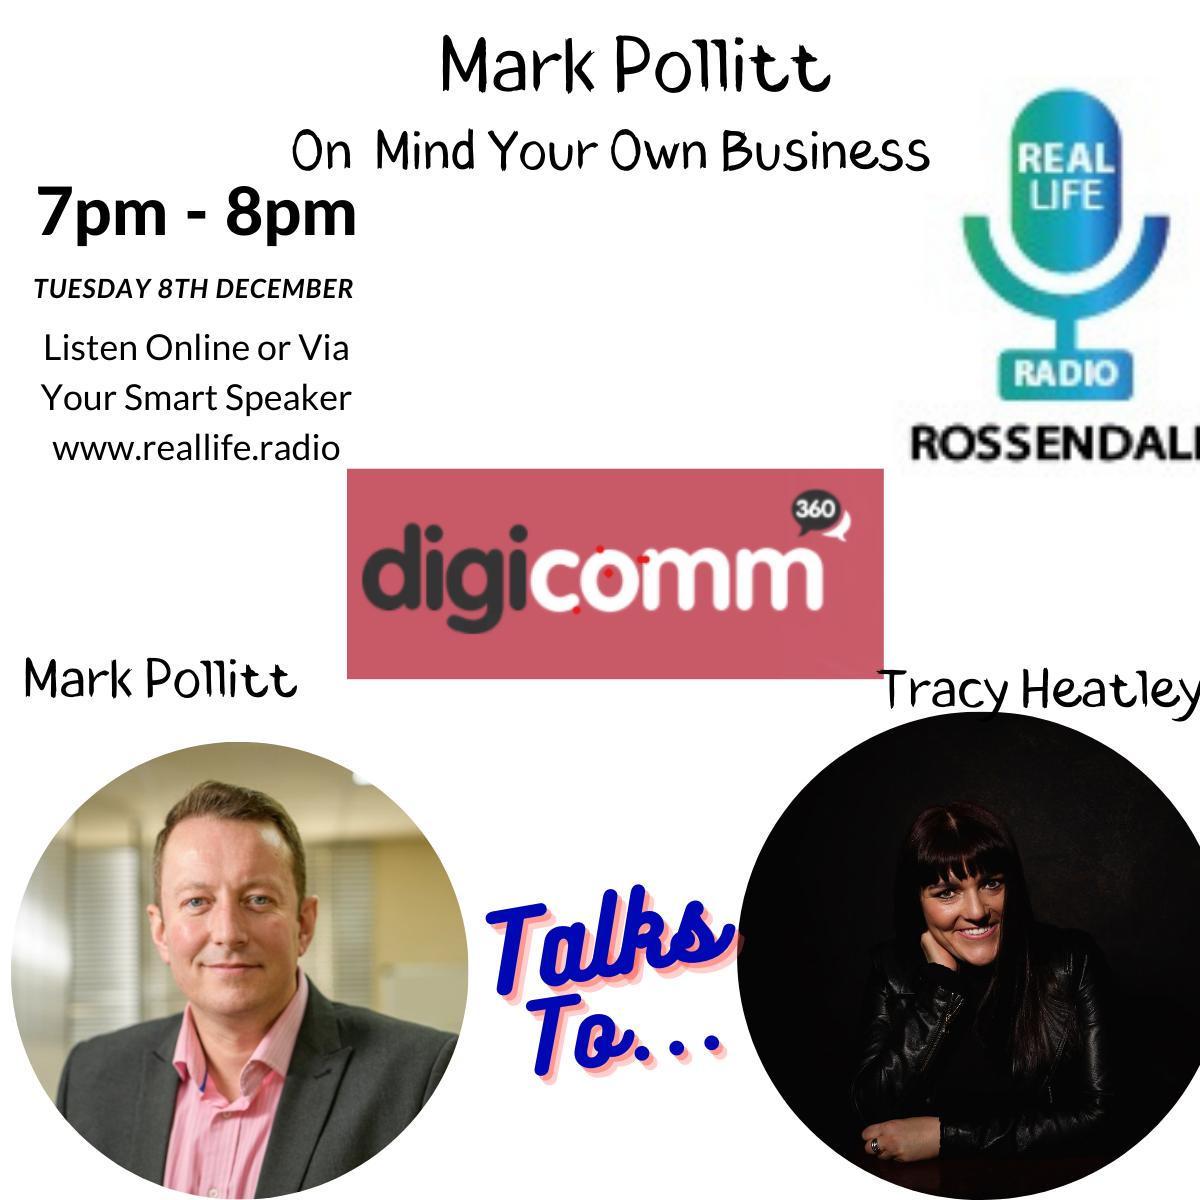 Mark Pollitt & Tracy Heatley On Real Life Radio